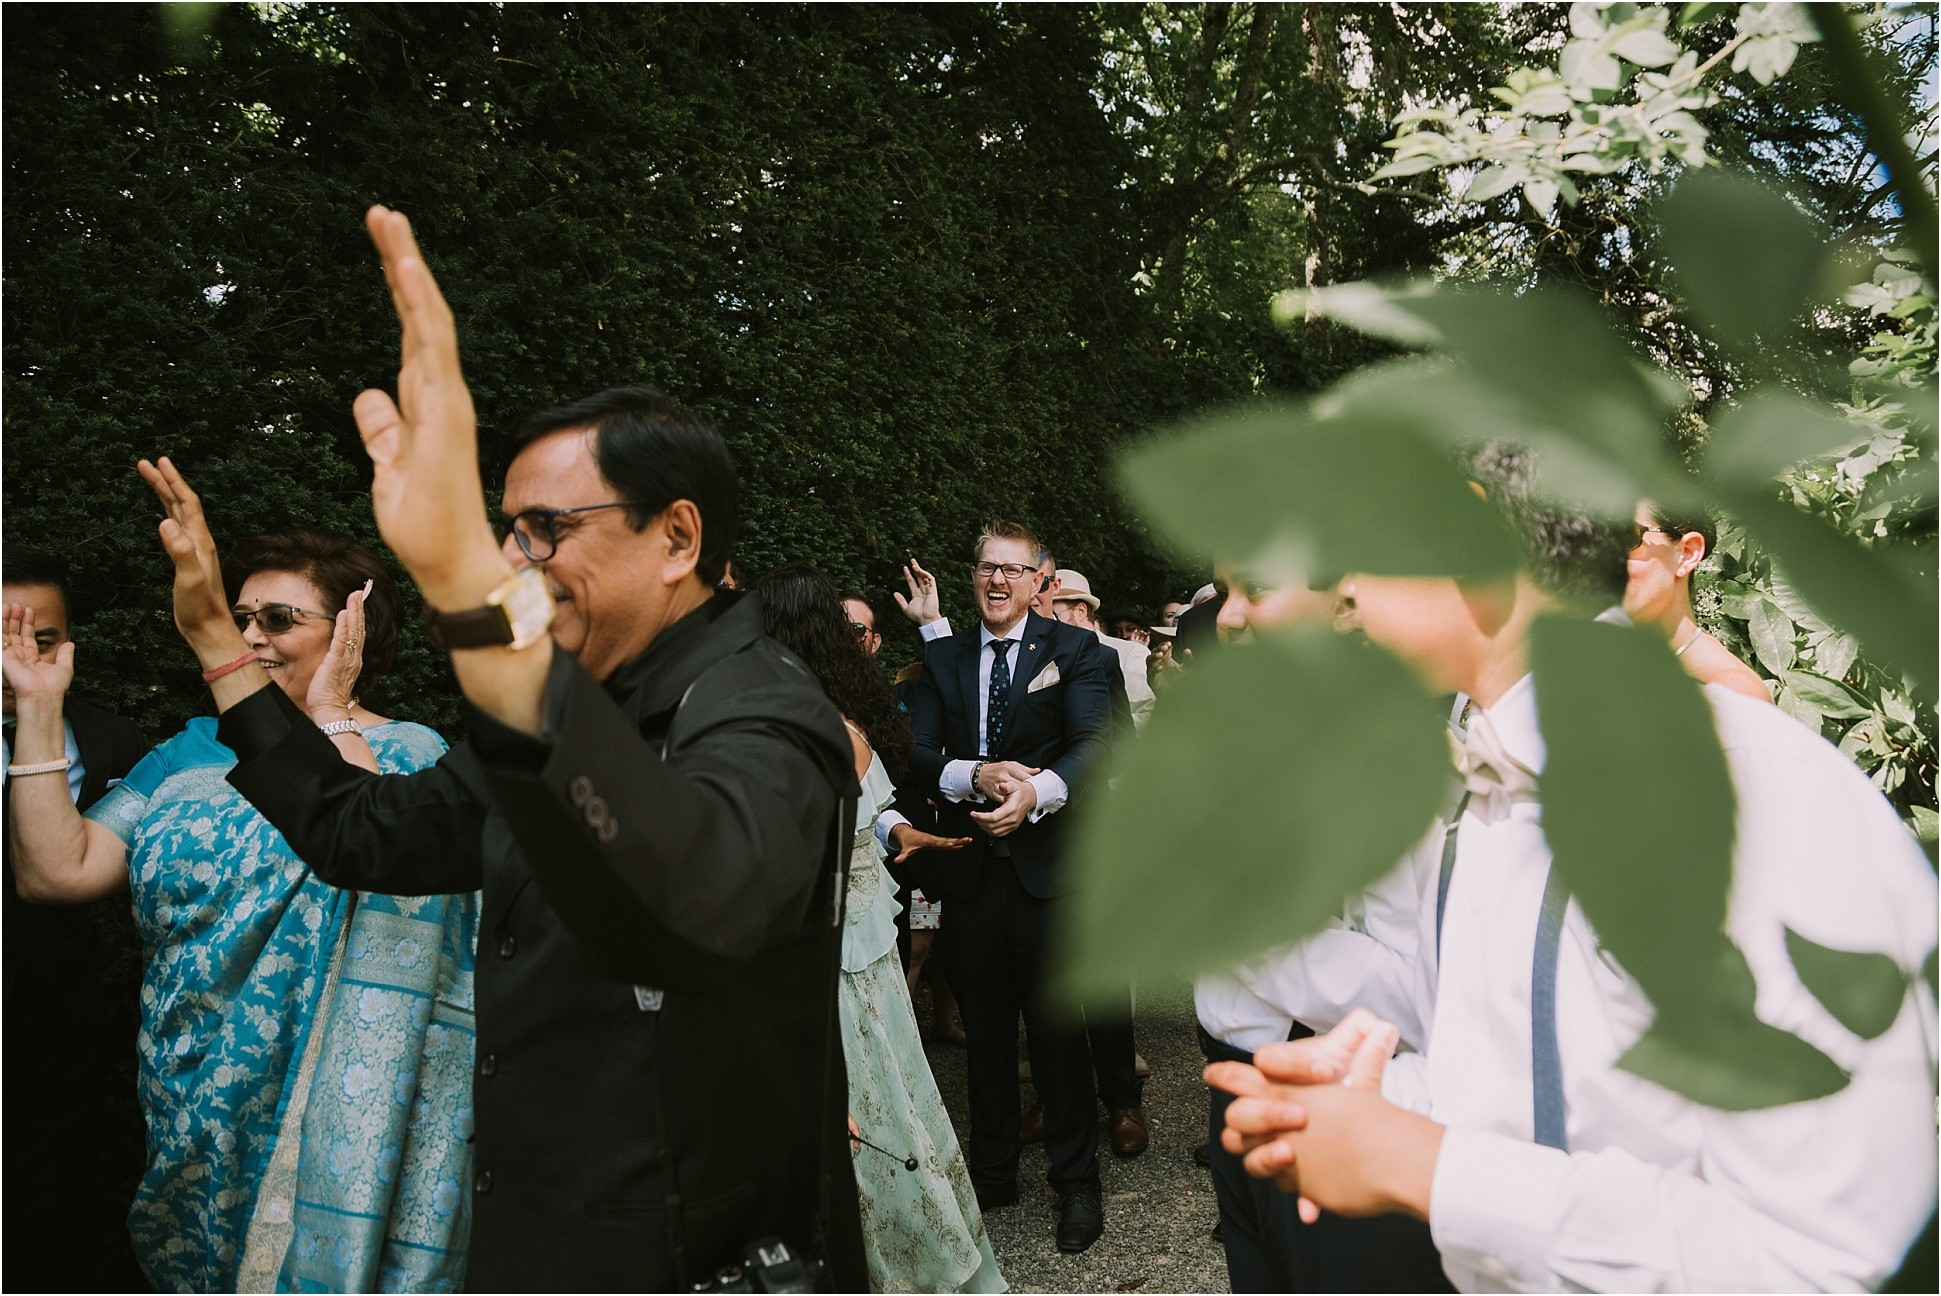 Kateryna-photos-photographe-mariage-chateau-st-paterne-mayenne-normandie_0110.jpg